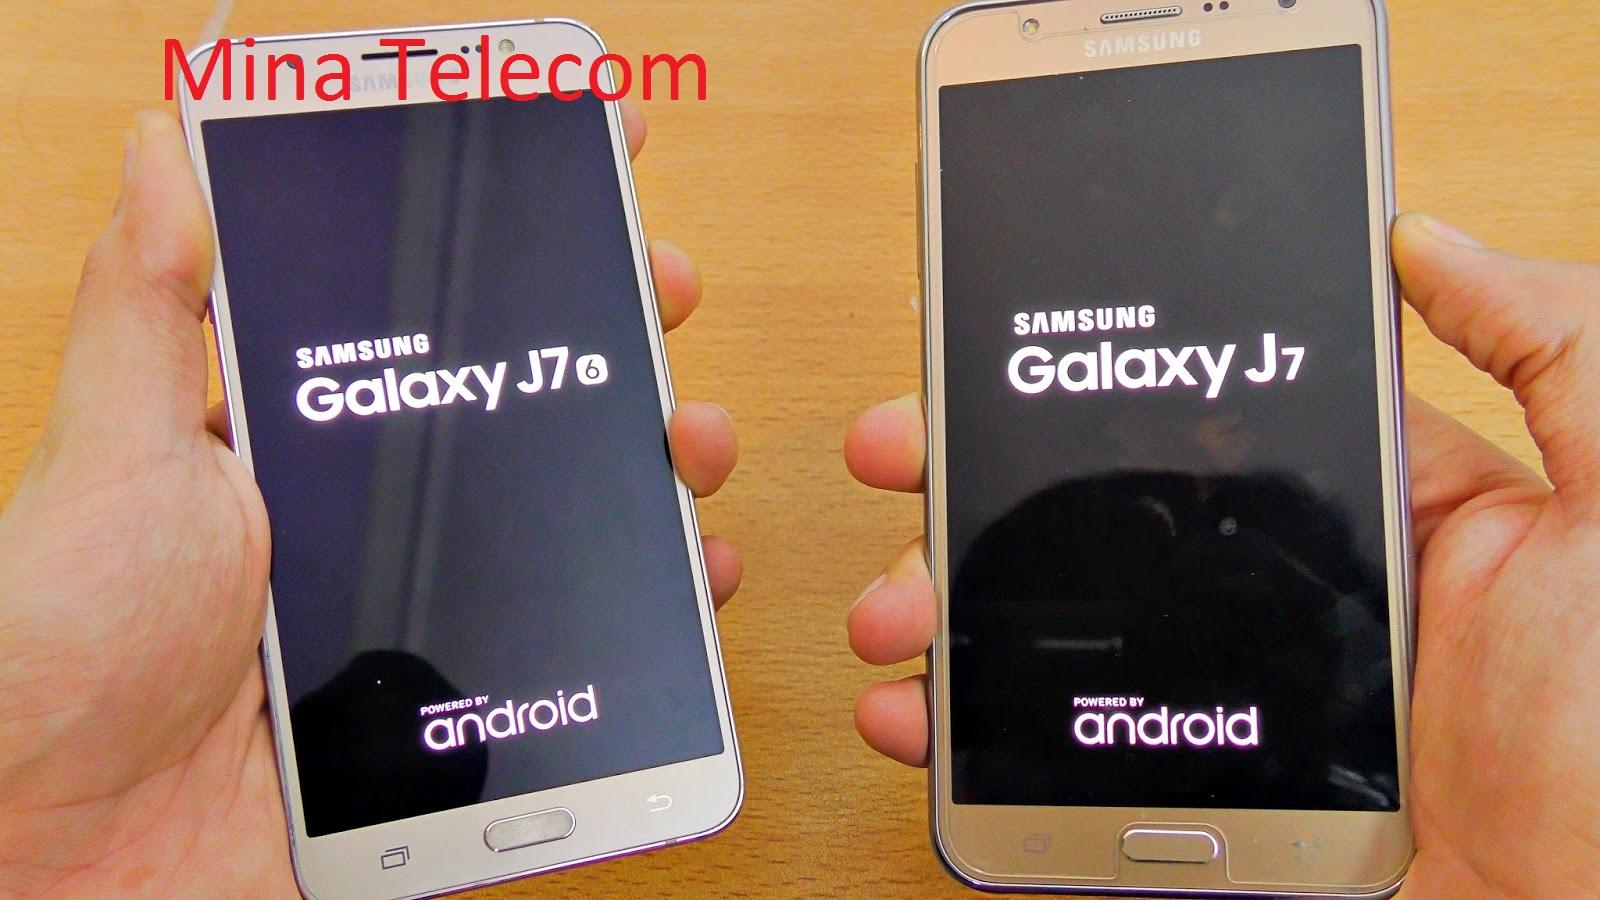 Mina Telecom (All Firmware Download Here) : Samsung Galaxy